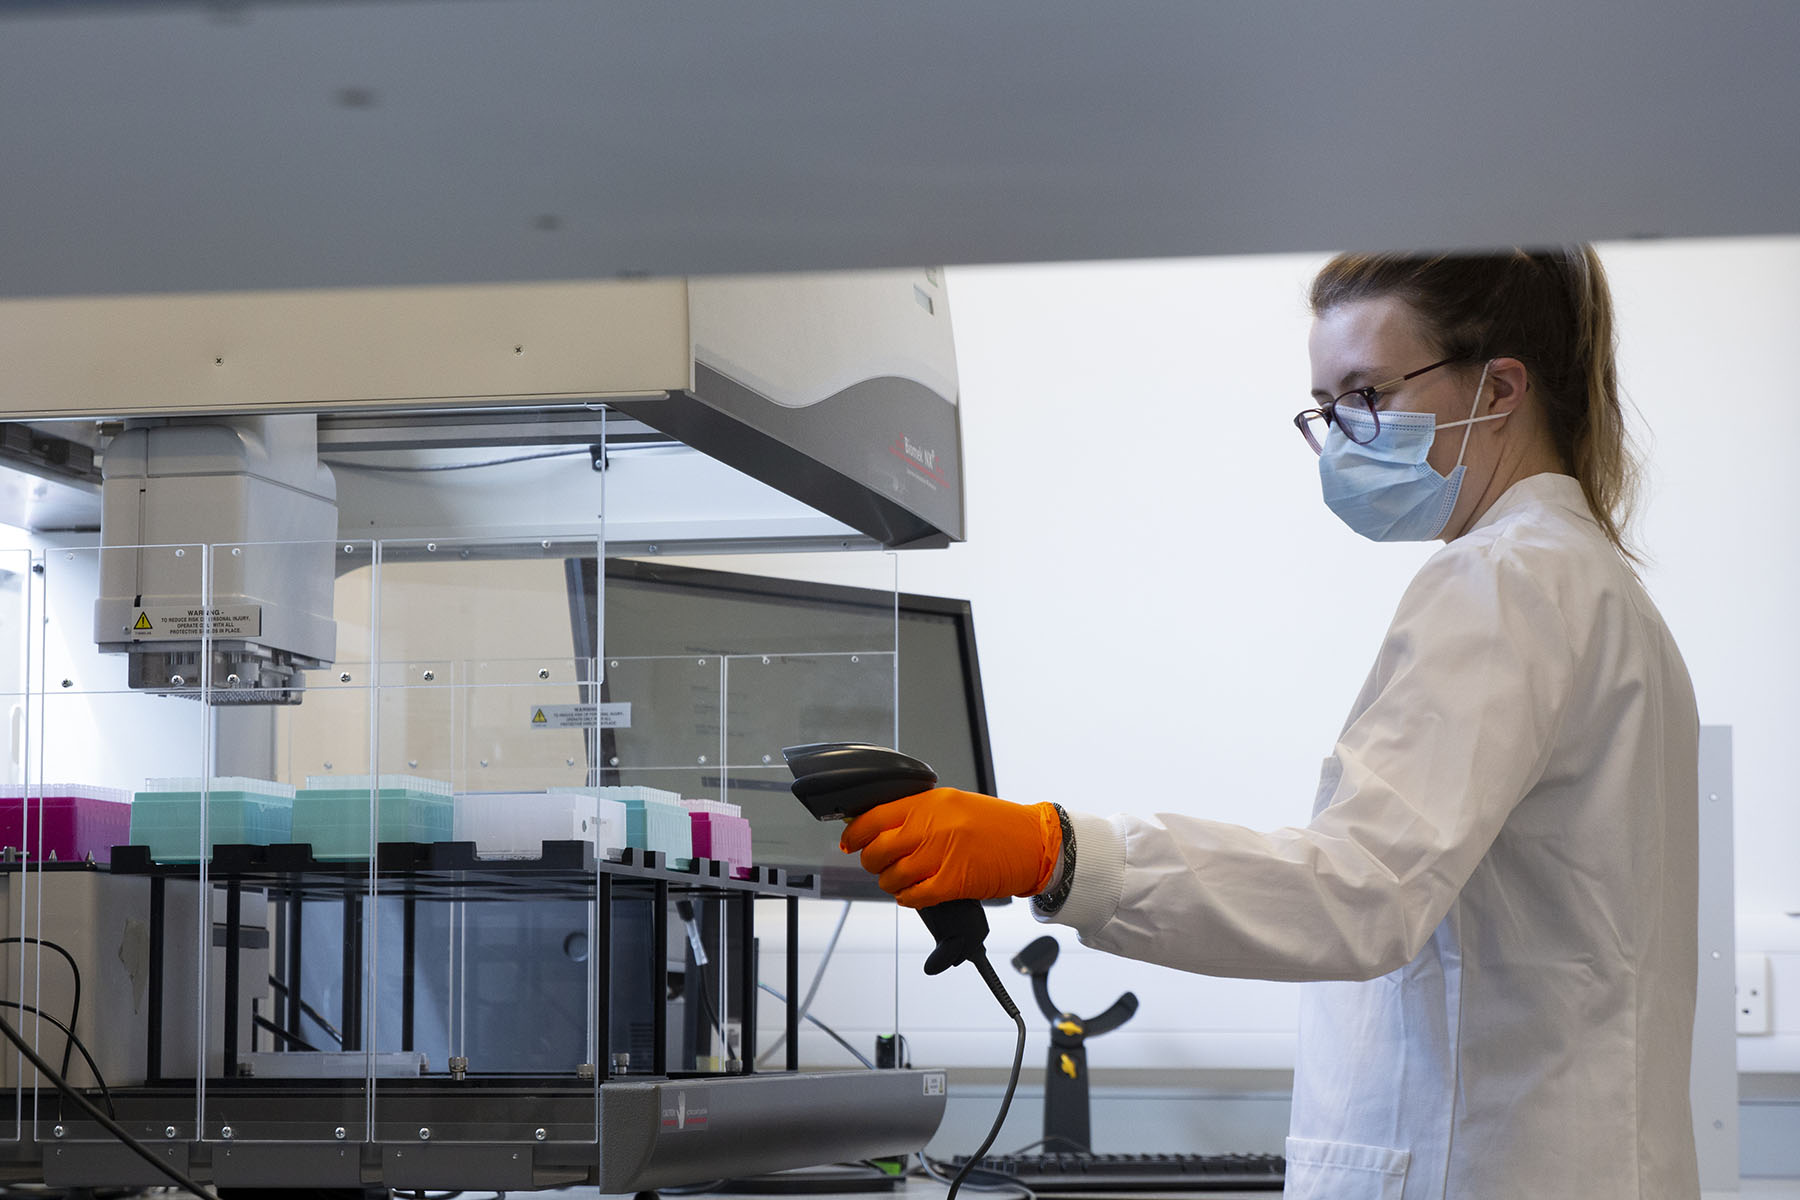 NEWSFLASH: Mass testing paves the way for weekly COVID checks